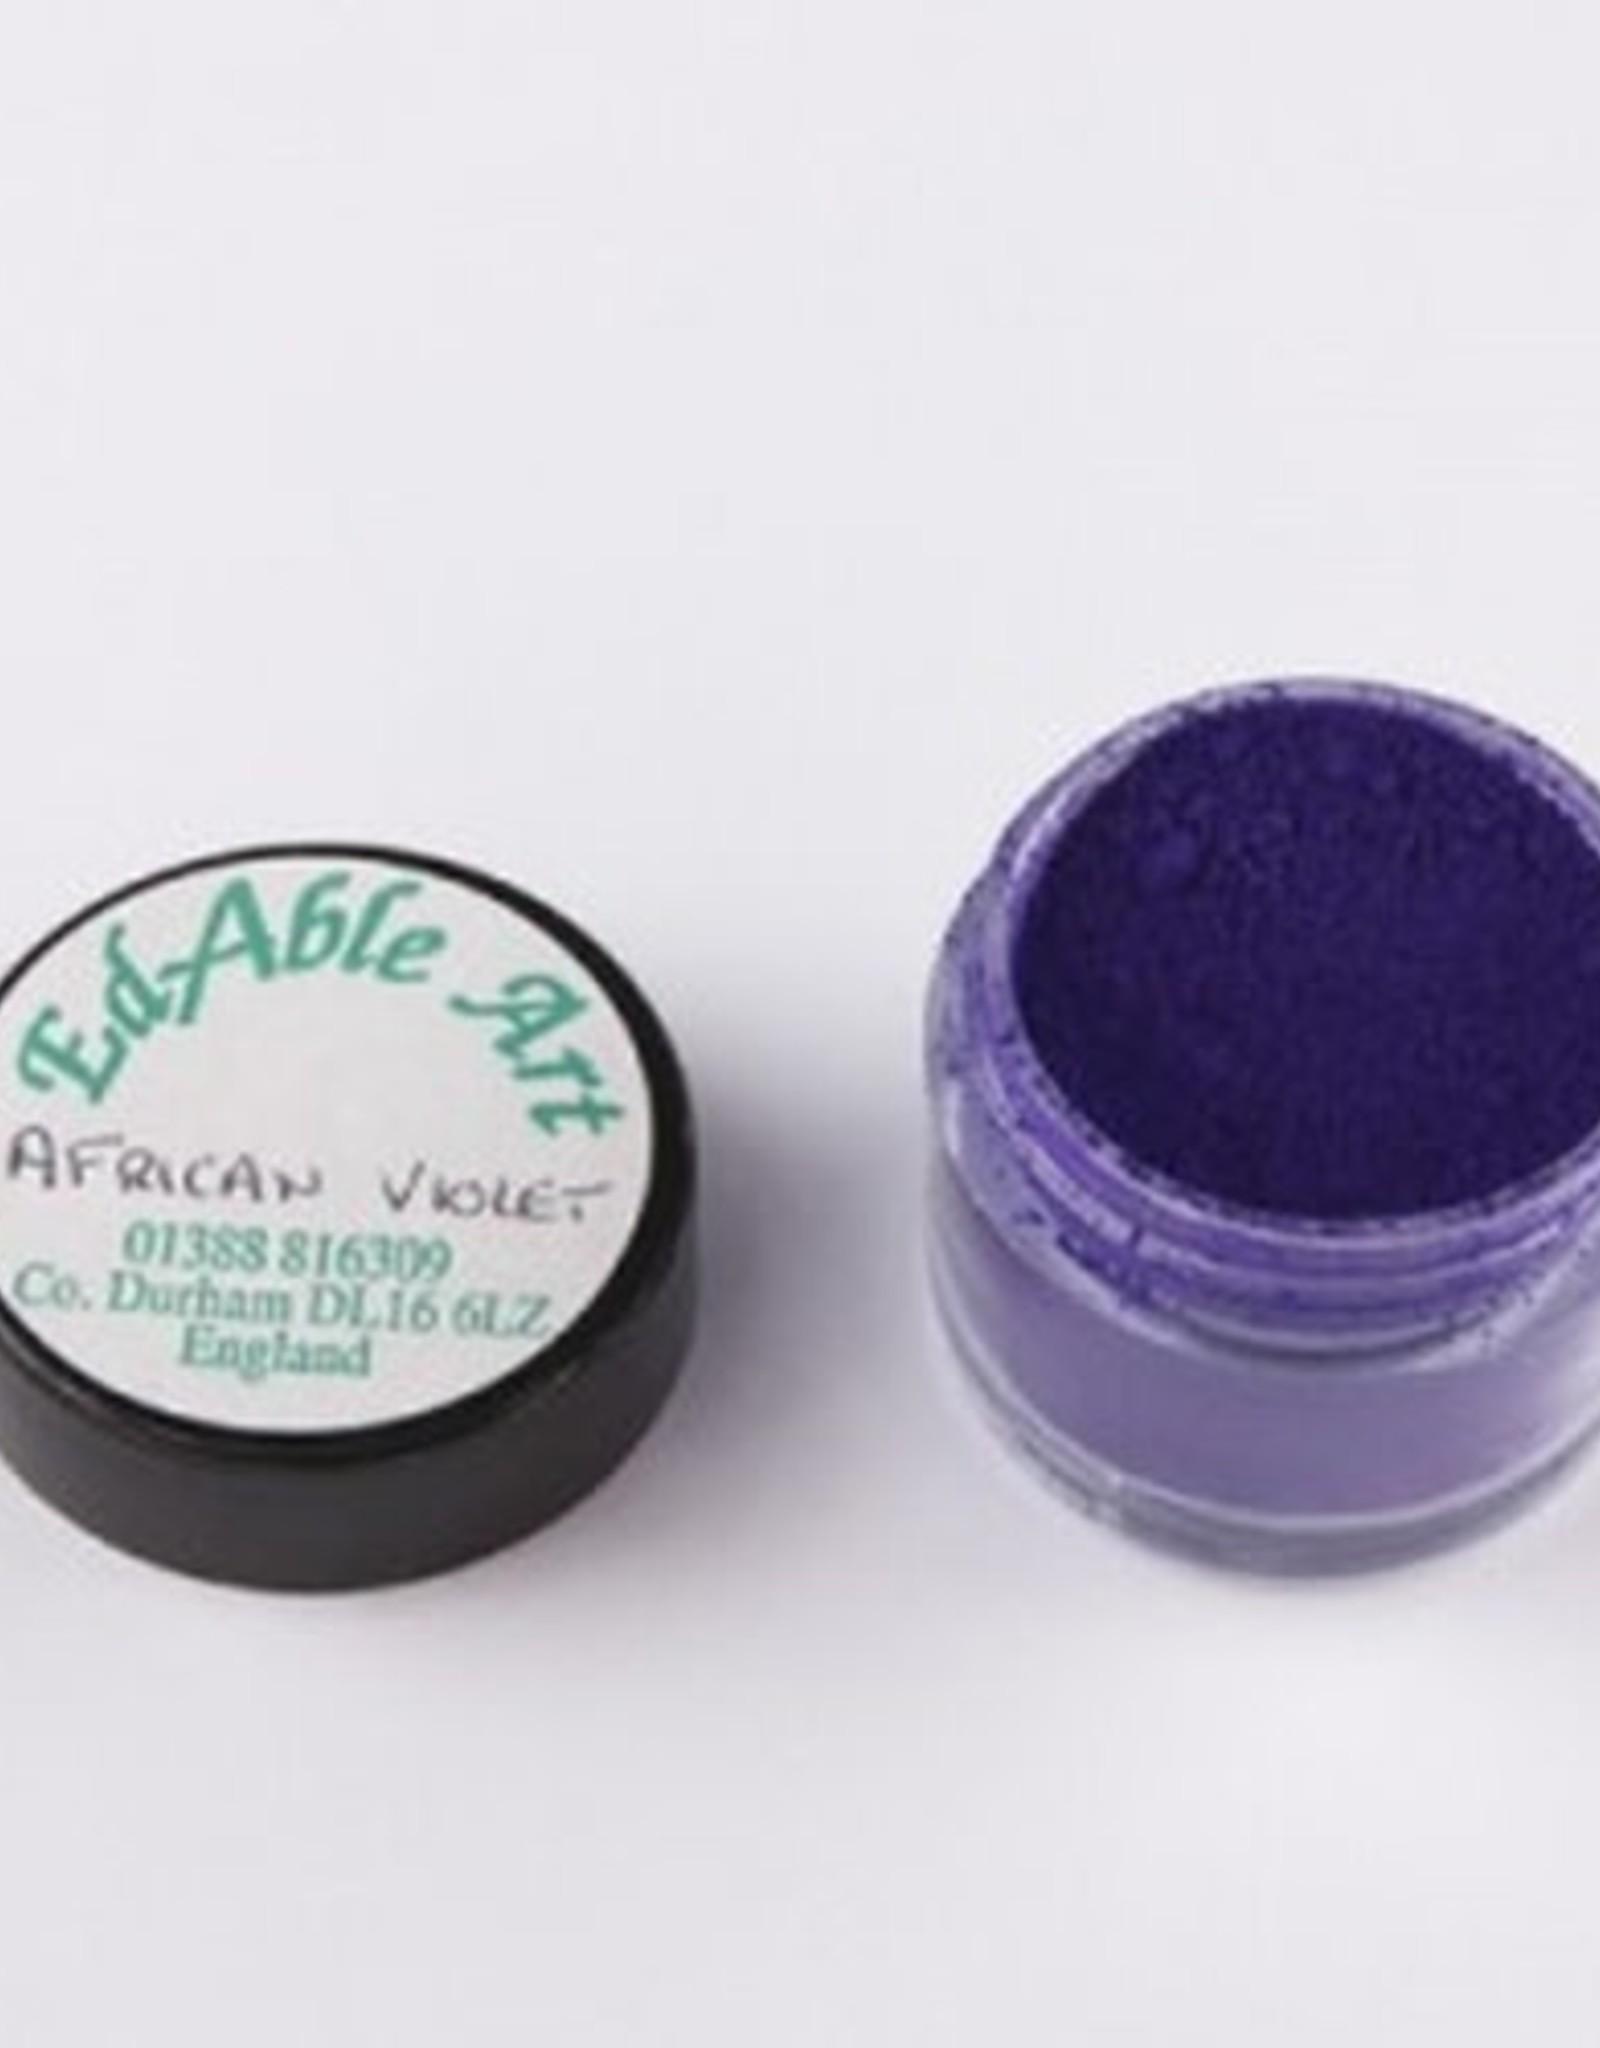 EdAble Art EdAble Art Black Top African Violet